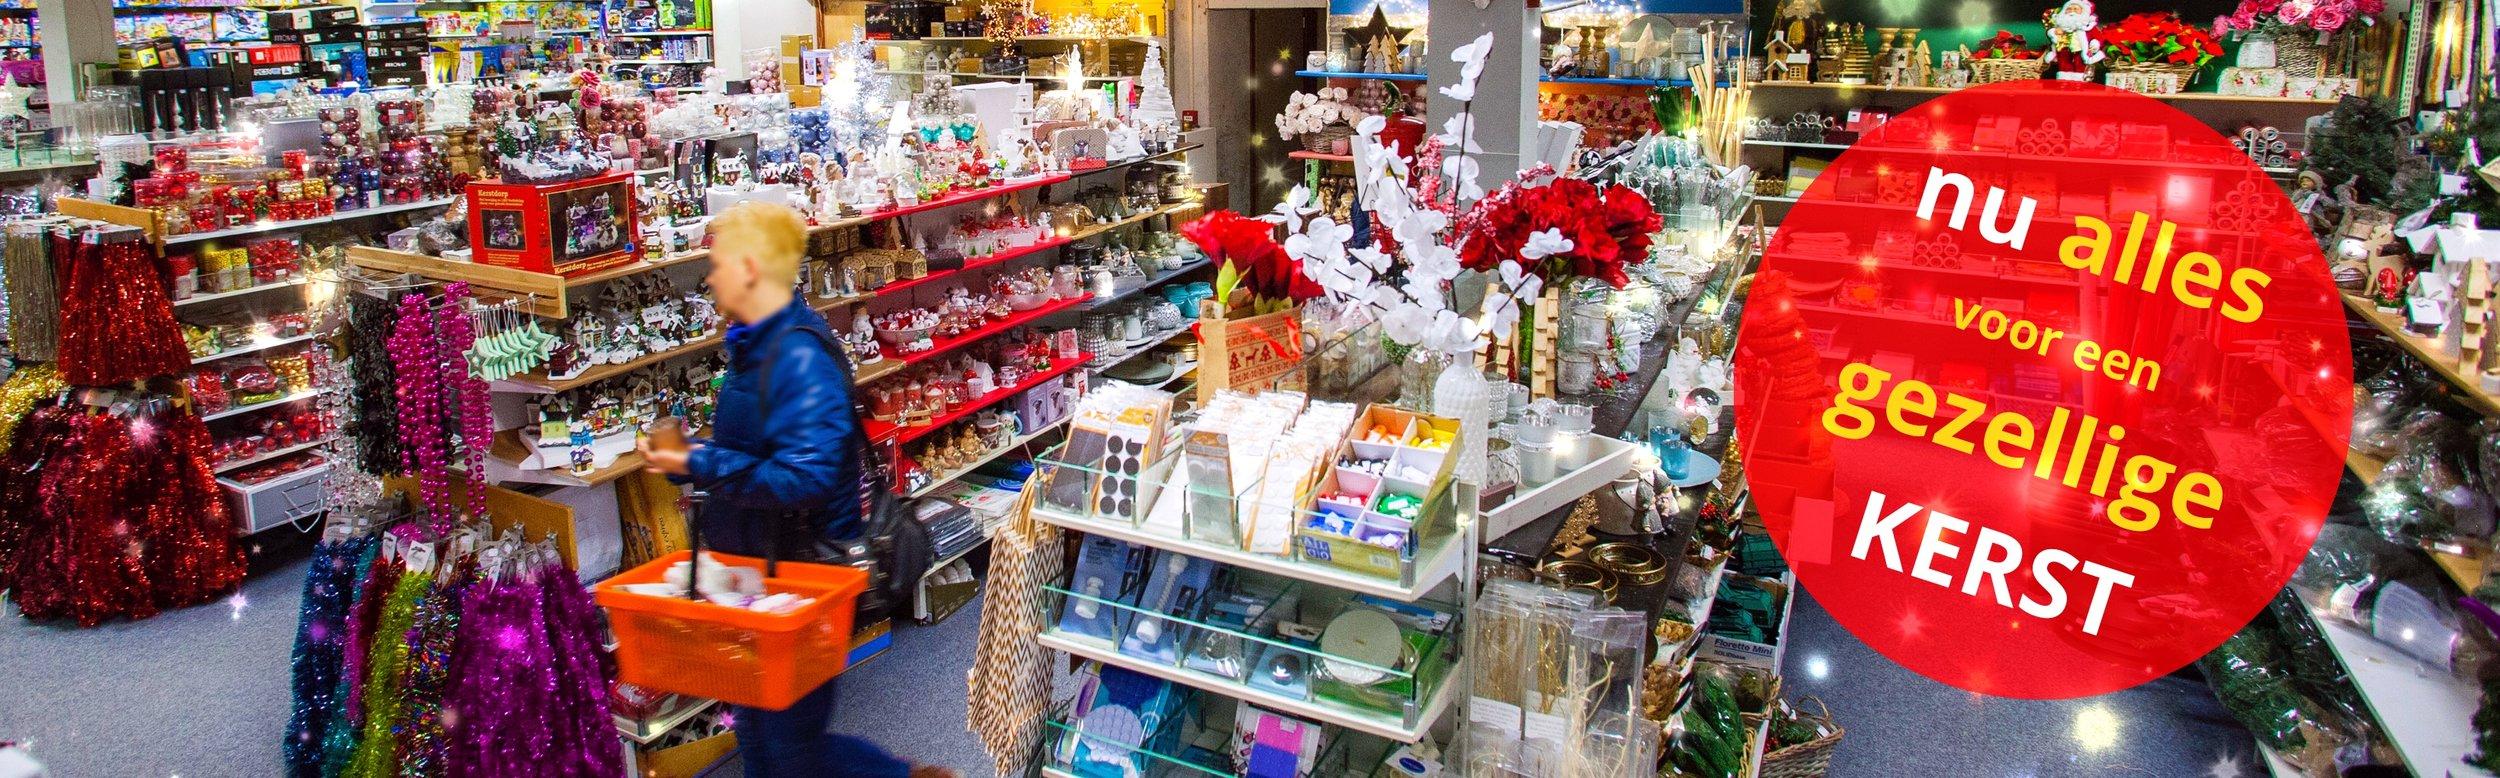 Staarink-warenhuis-kerstafdeling-foto-Peter-Bakker-v5.JPG